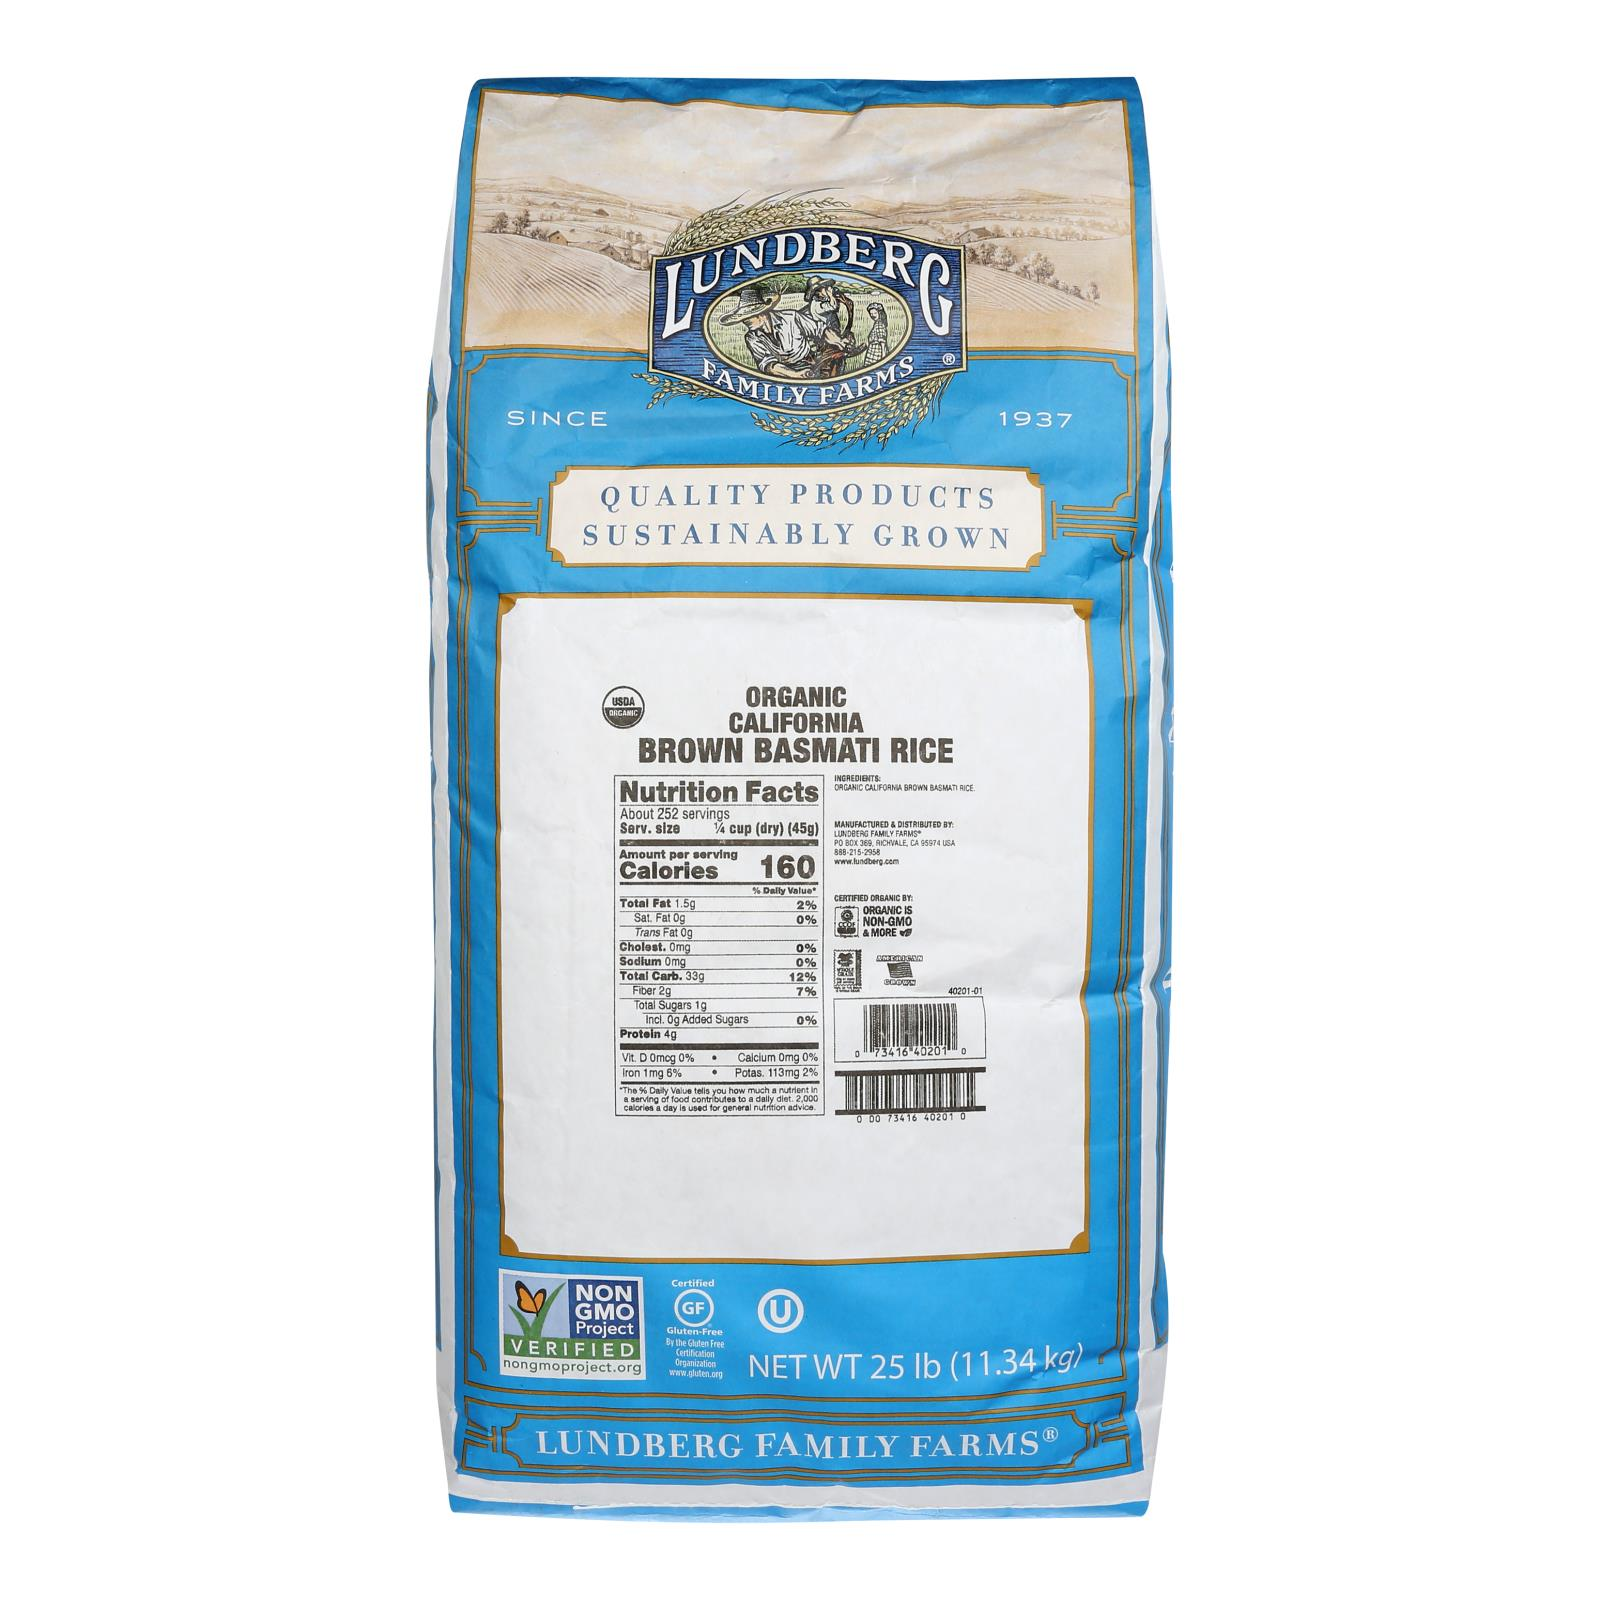 Lundberg Family Farms Organic Rice - Brown Basmati - Case of 25 lbs